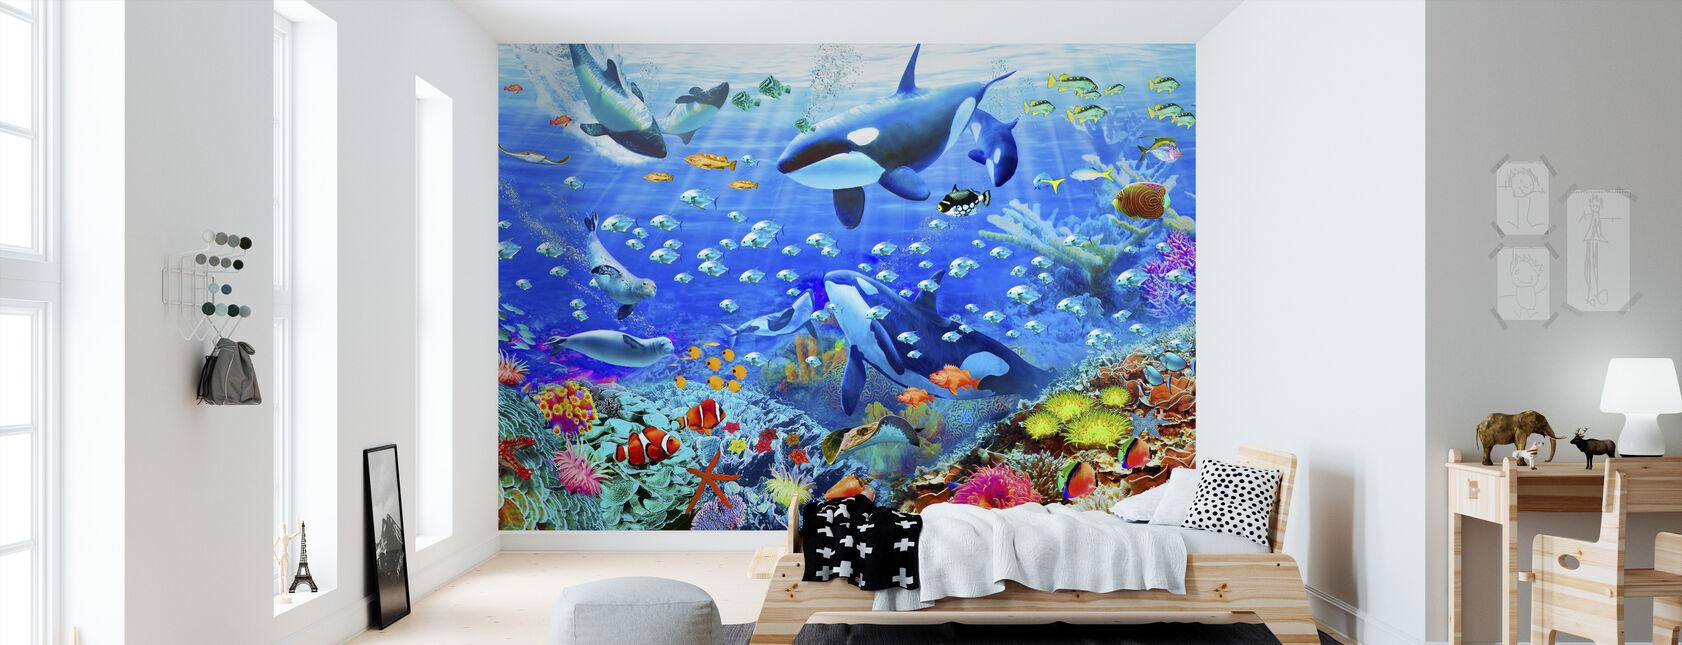 Onderwater Panorama - Behang - Kinderkamer